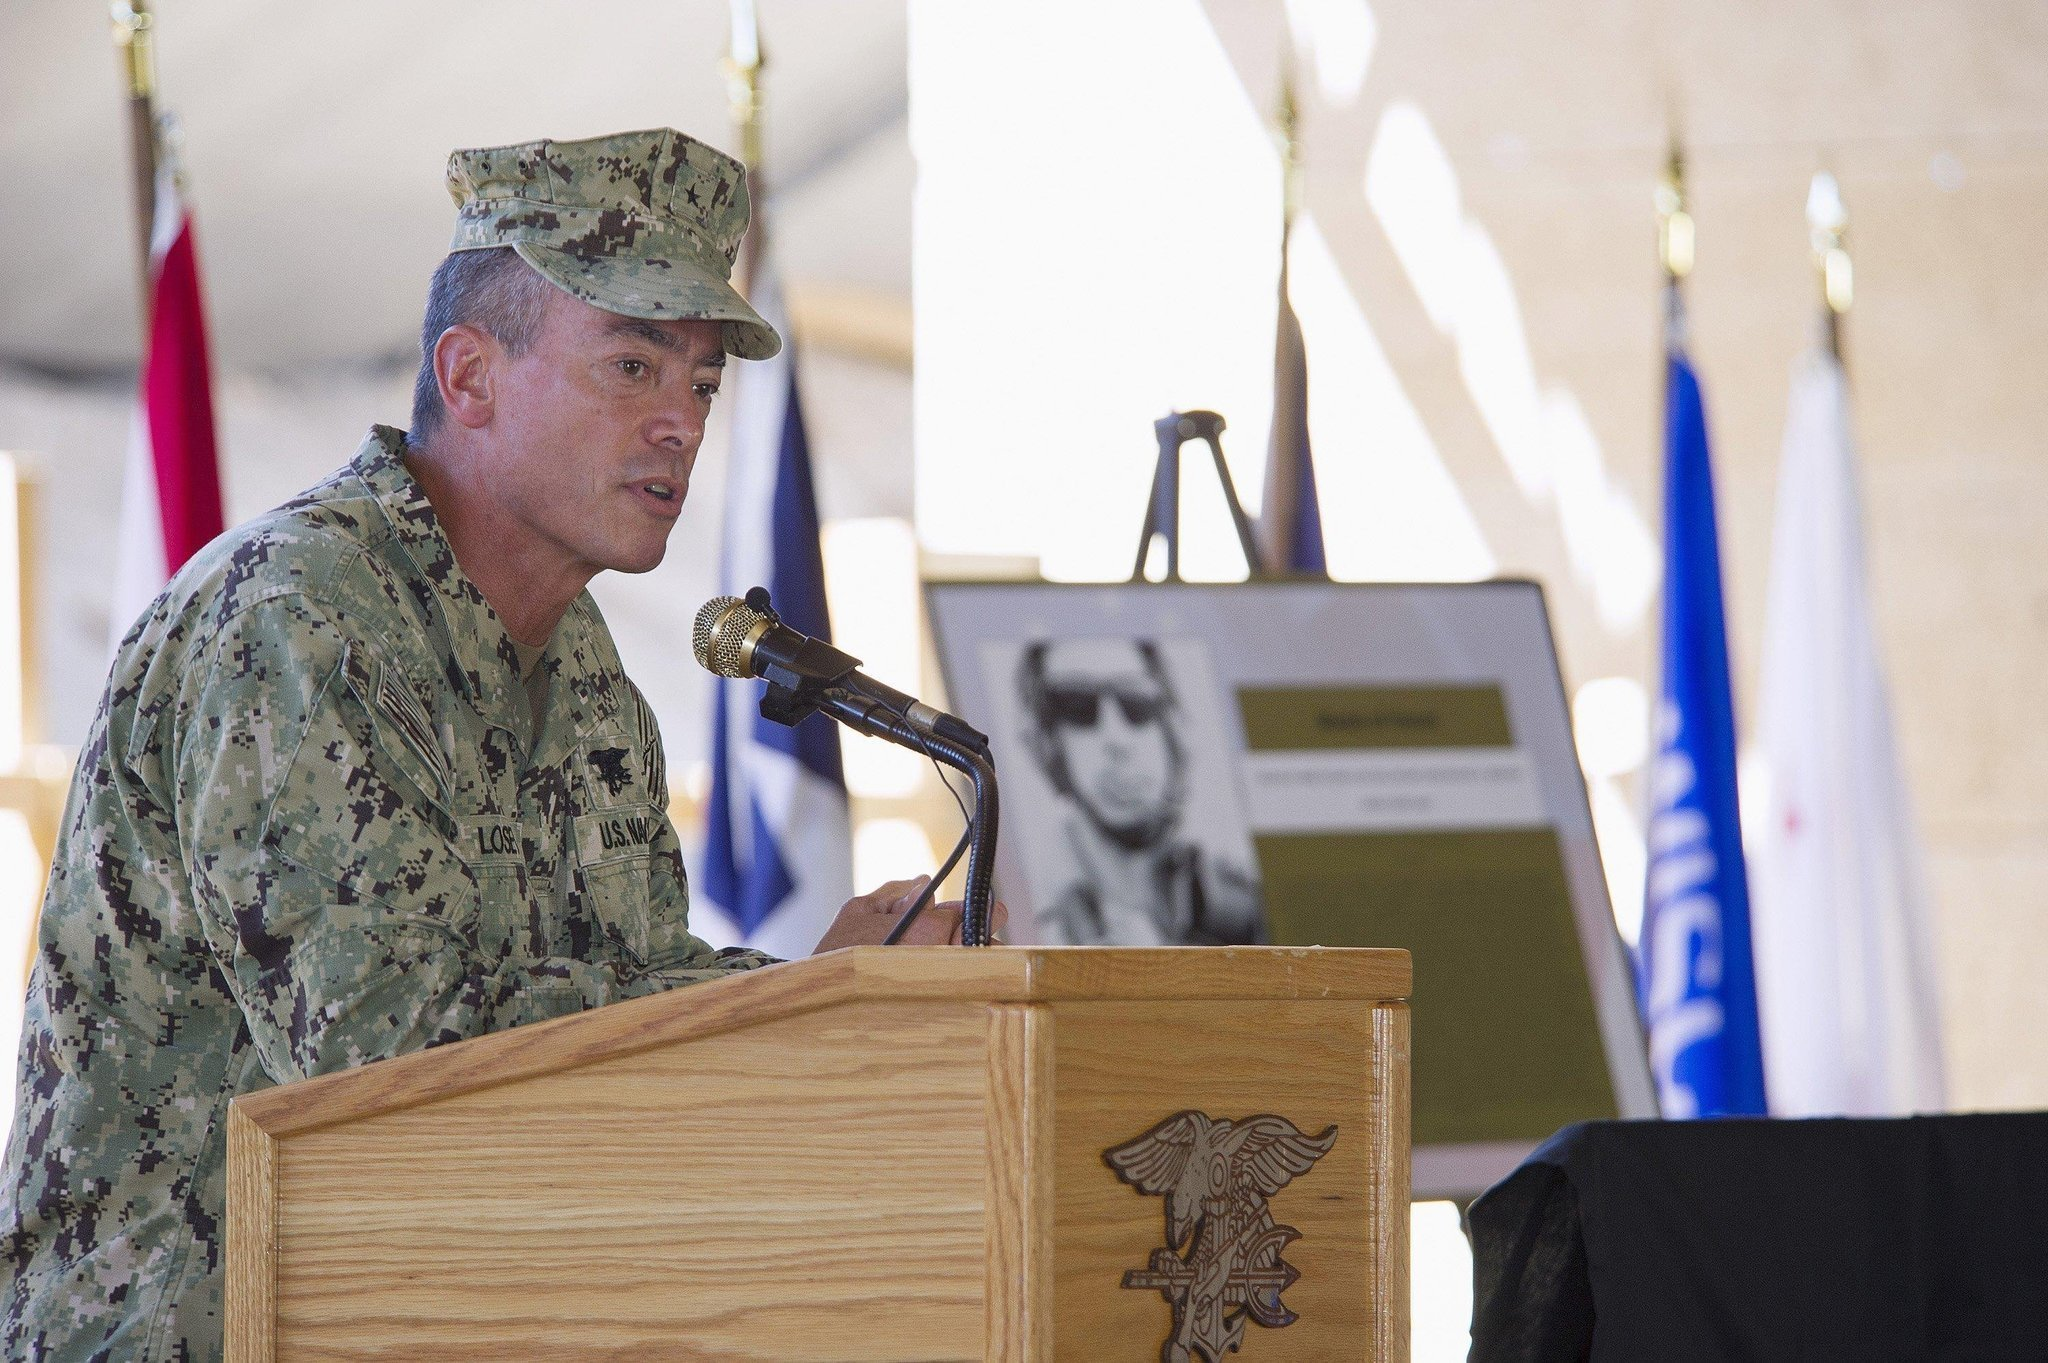 Navy Seal Admiral S Rare Public Punishment The San